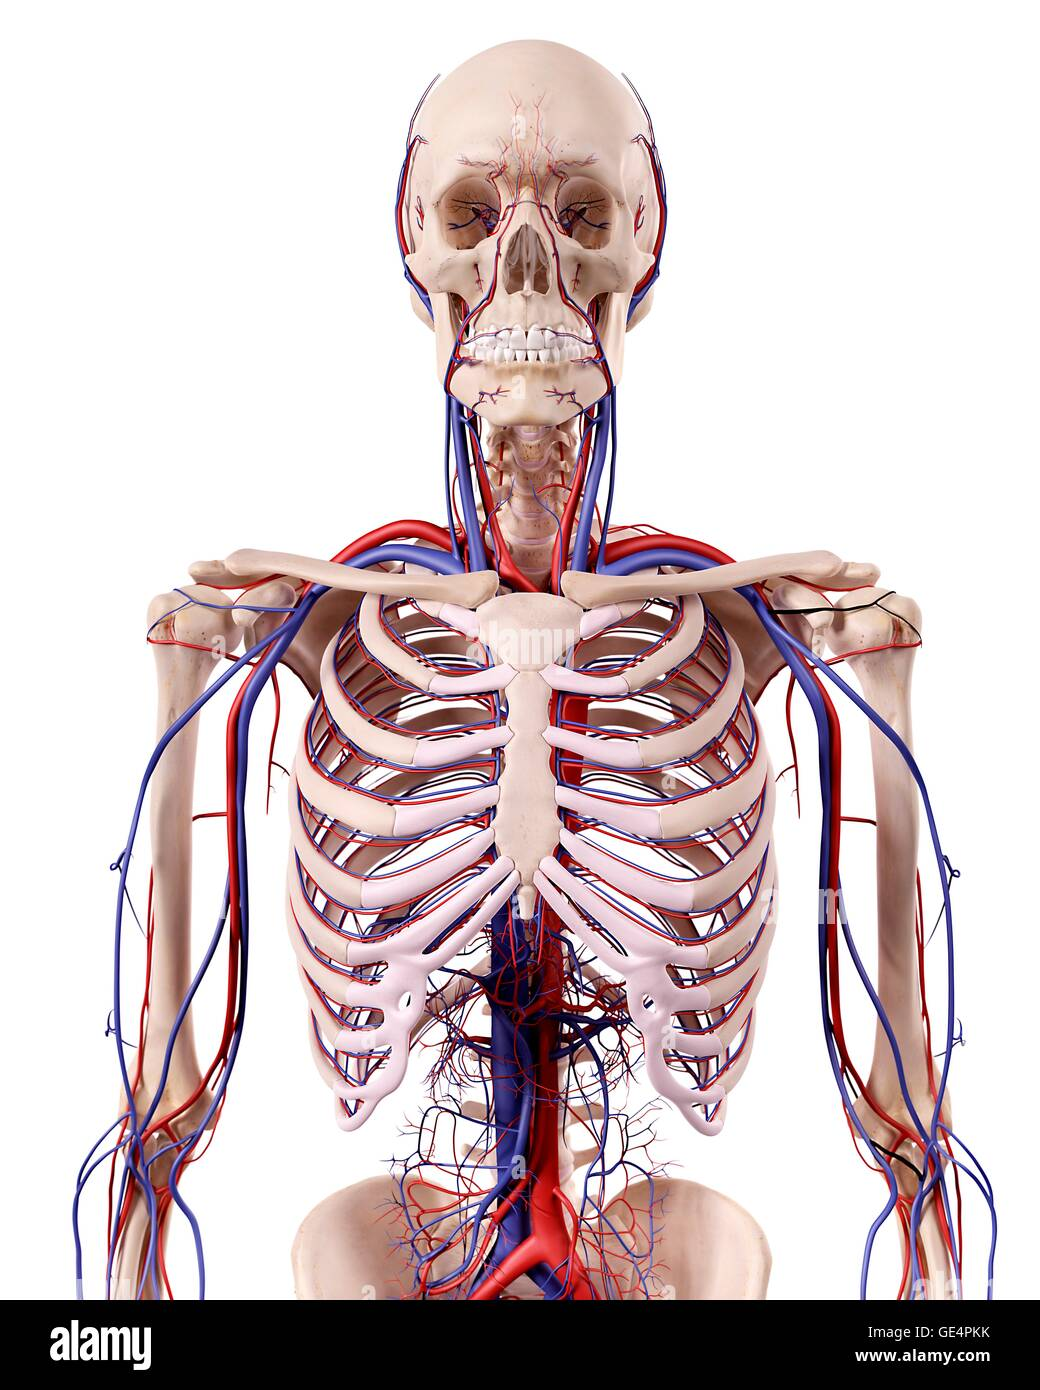 Human Thoracic Anatomy Illustration Stock Photo 111972999 Alamy